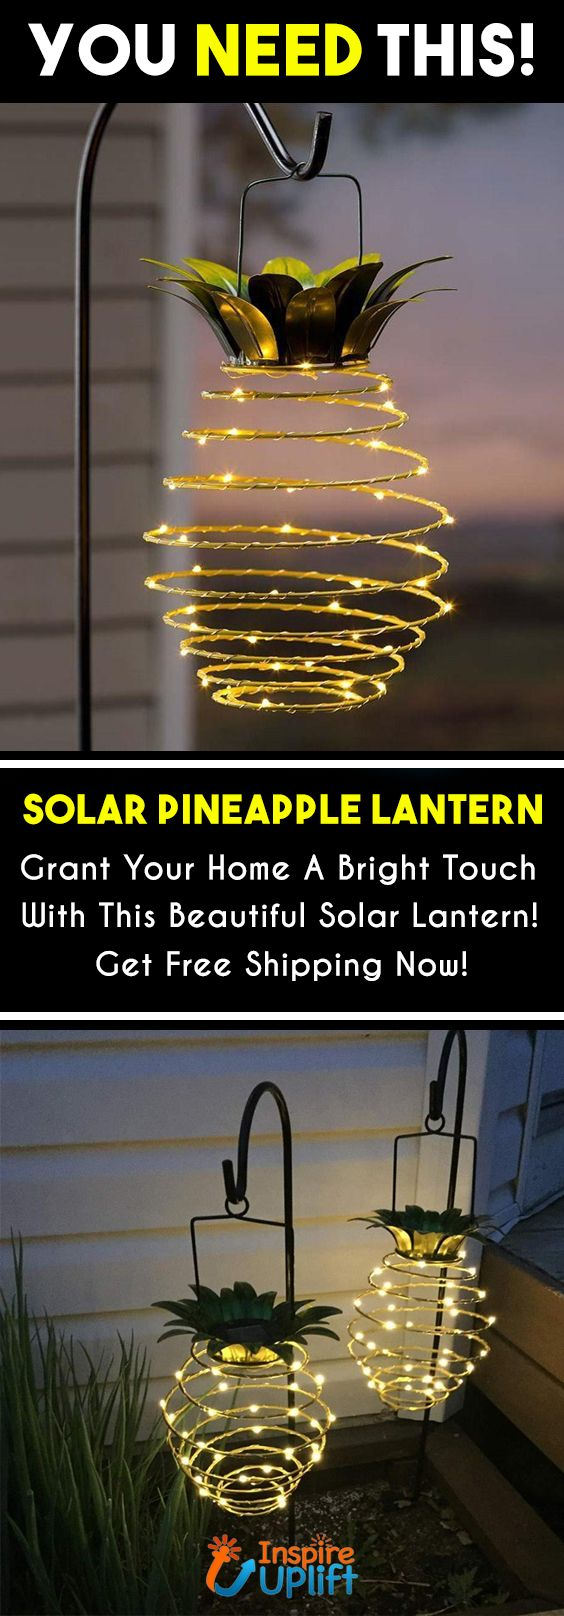 Solar Pineapple Lantern 😍